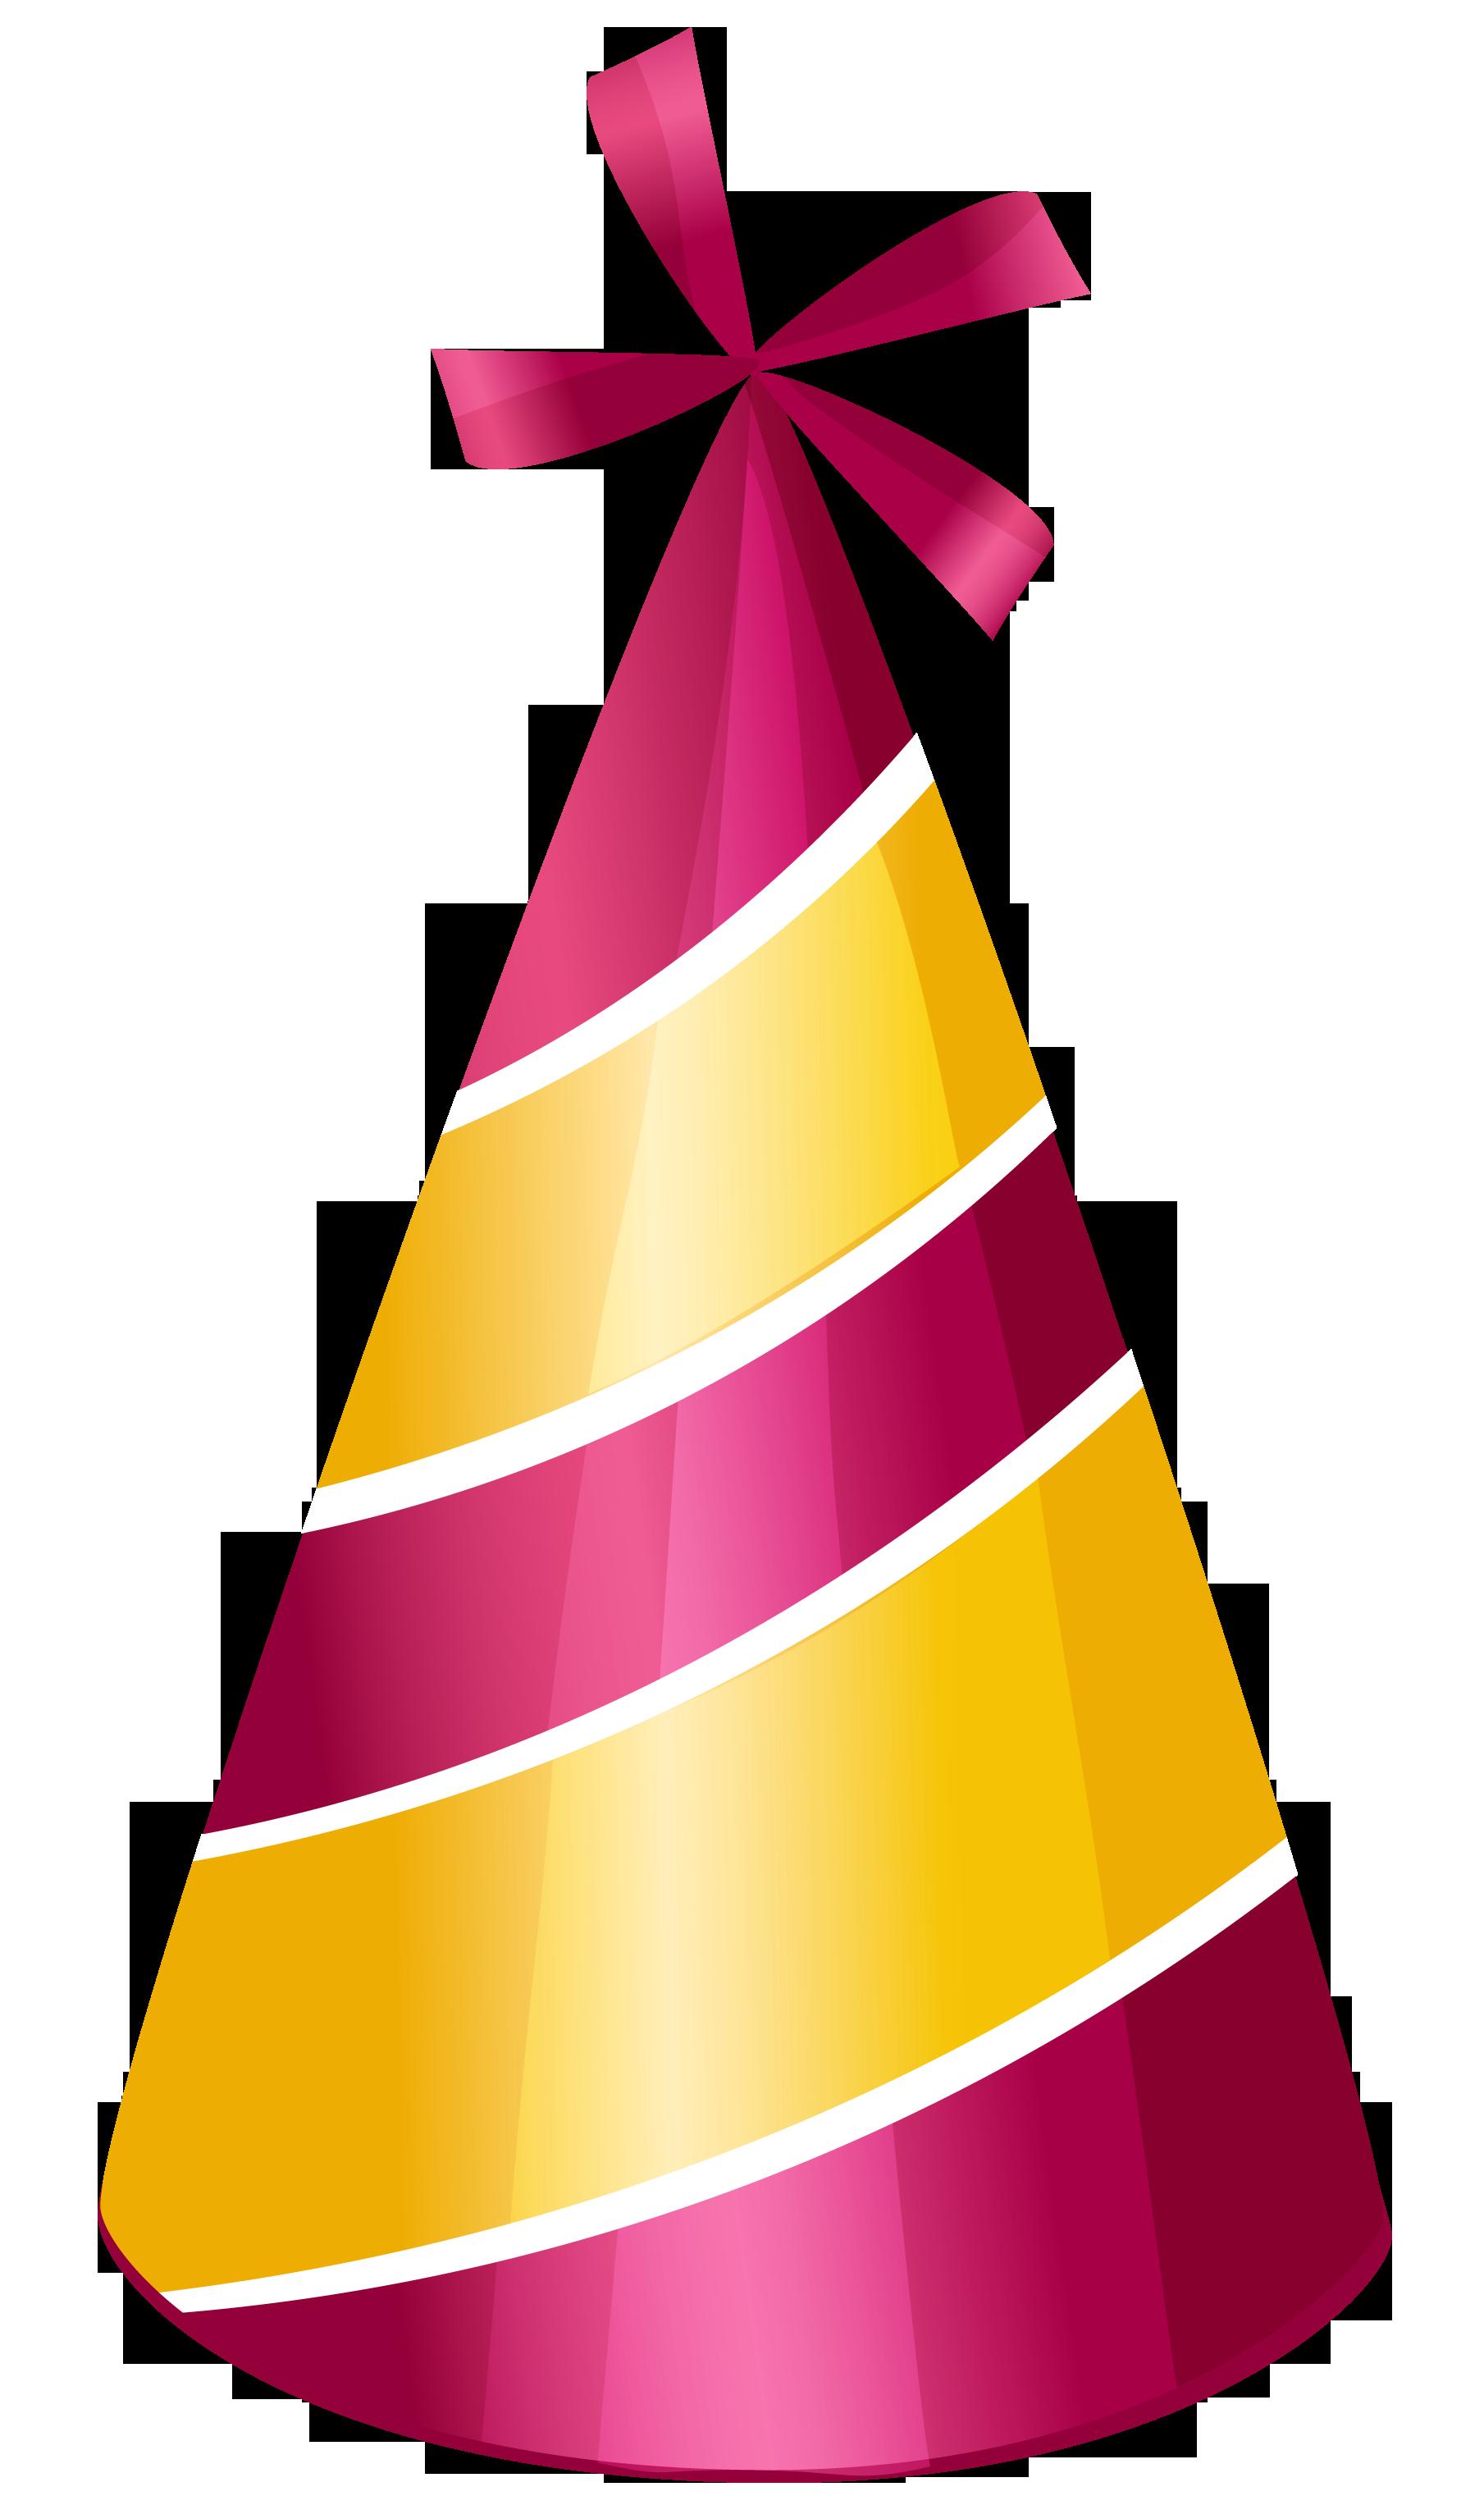 Hat clipart happy birthday Transparent Art Art Hat ·